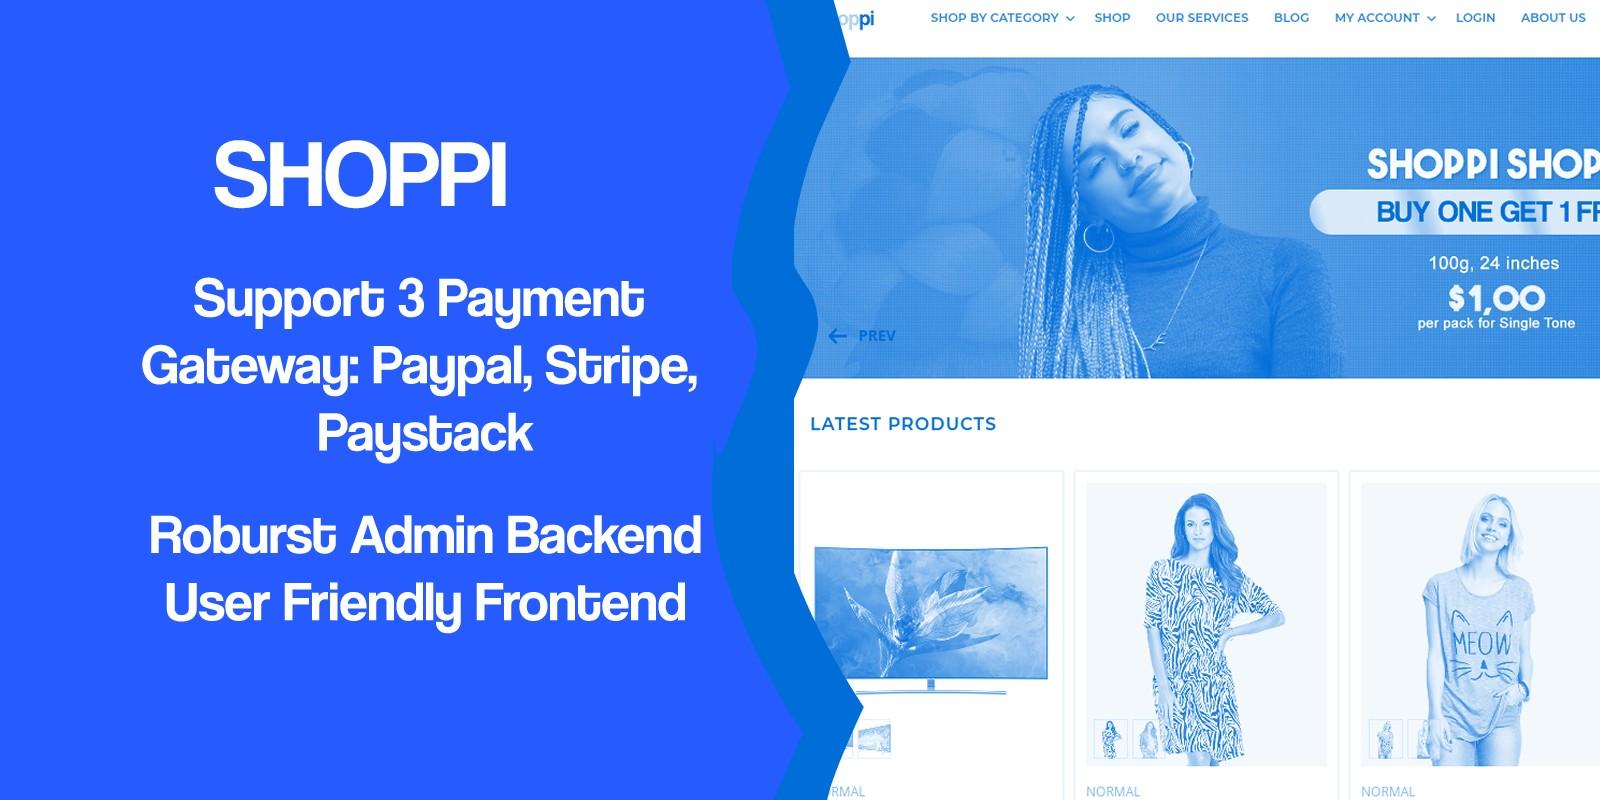 Shoppi - Ecommerce Online Shop PHP Script